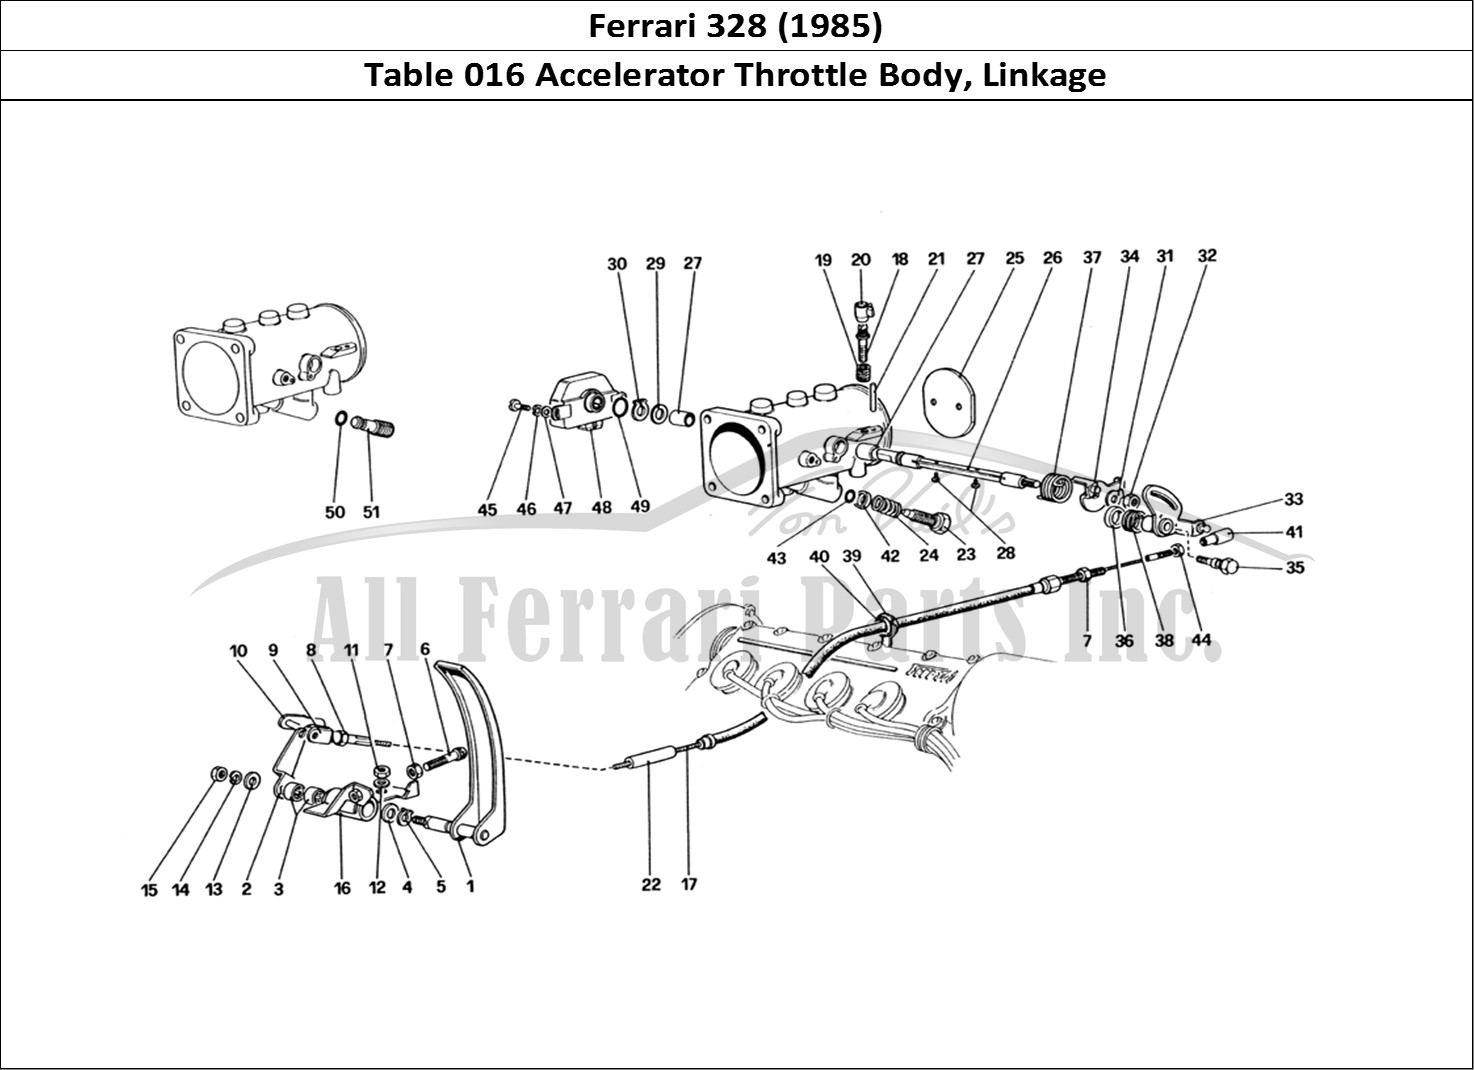 Buy Original Ferrari 328 016 Accelerator Throttle